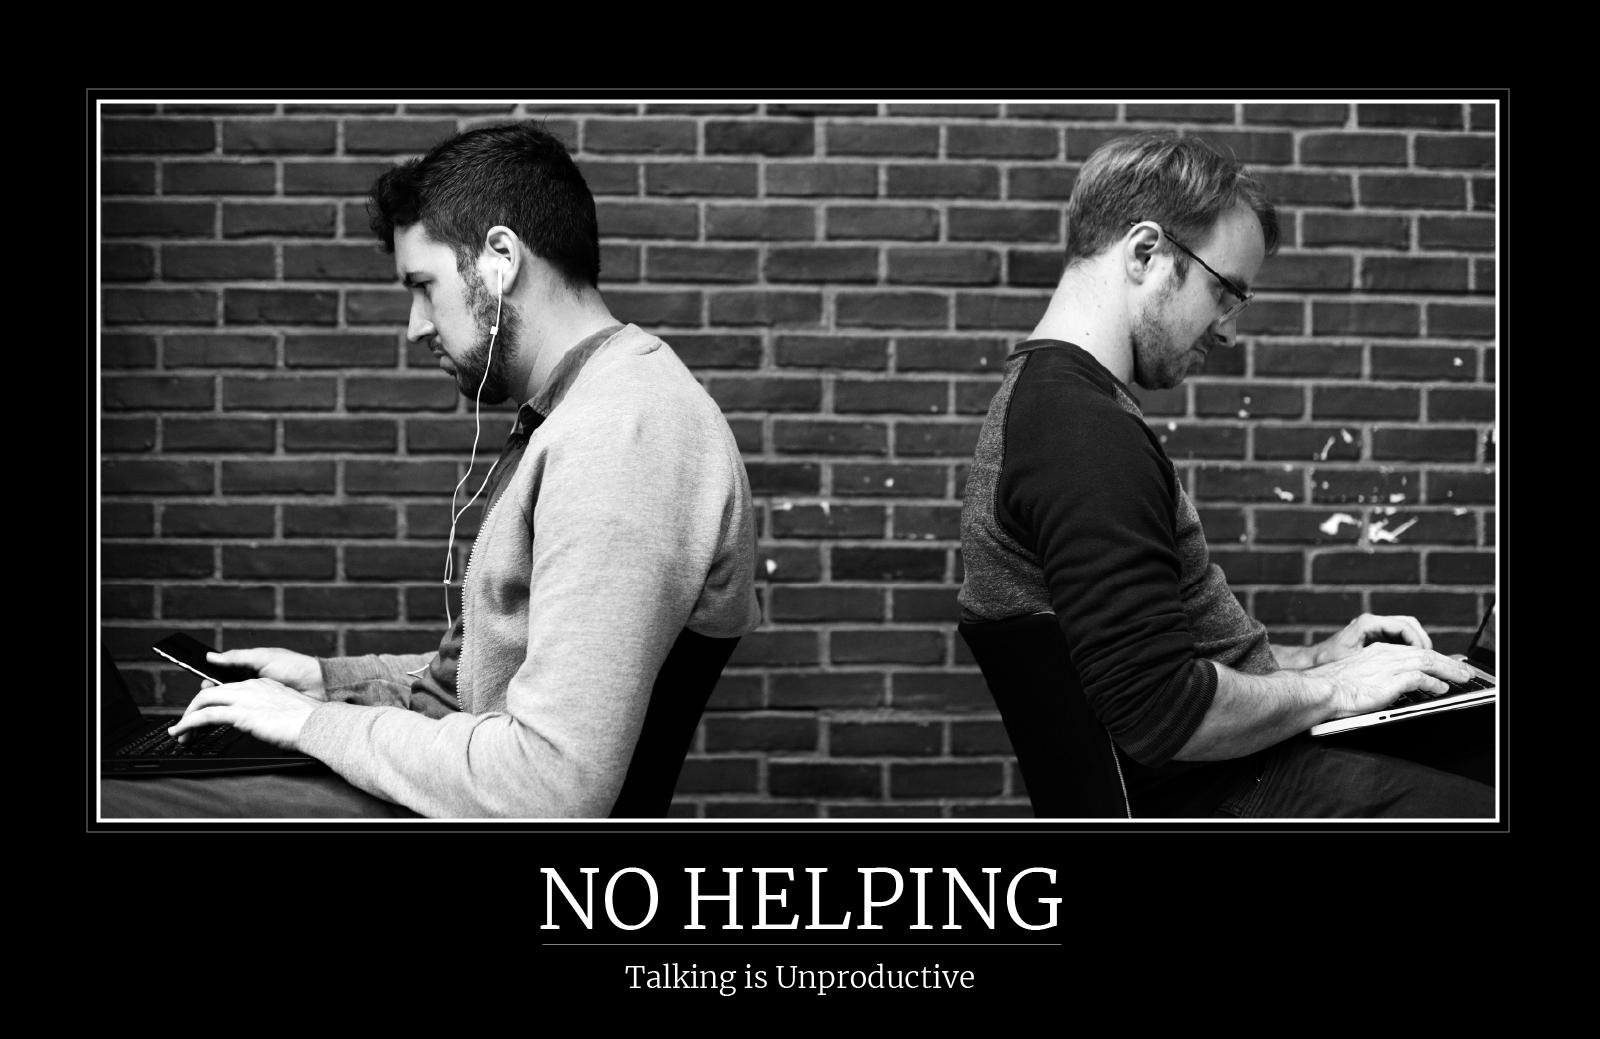 No Helping